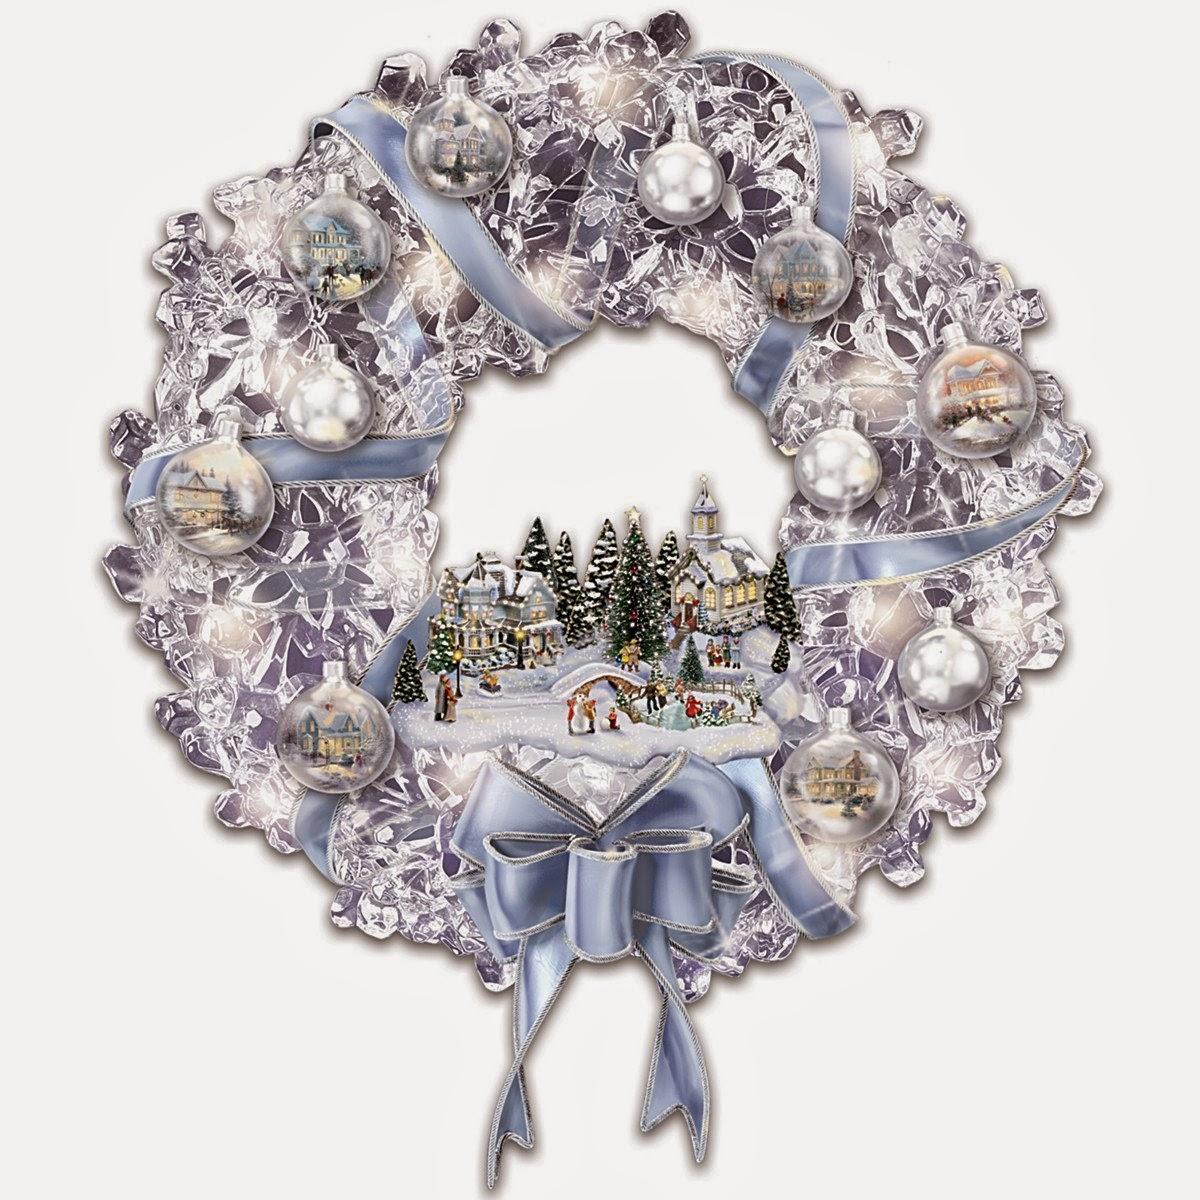 http://favored.hubpages.com/hub/thomas-kinkade-blessings-of-christmas